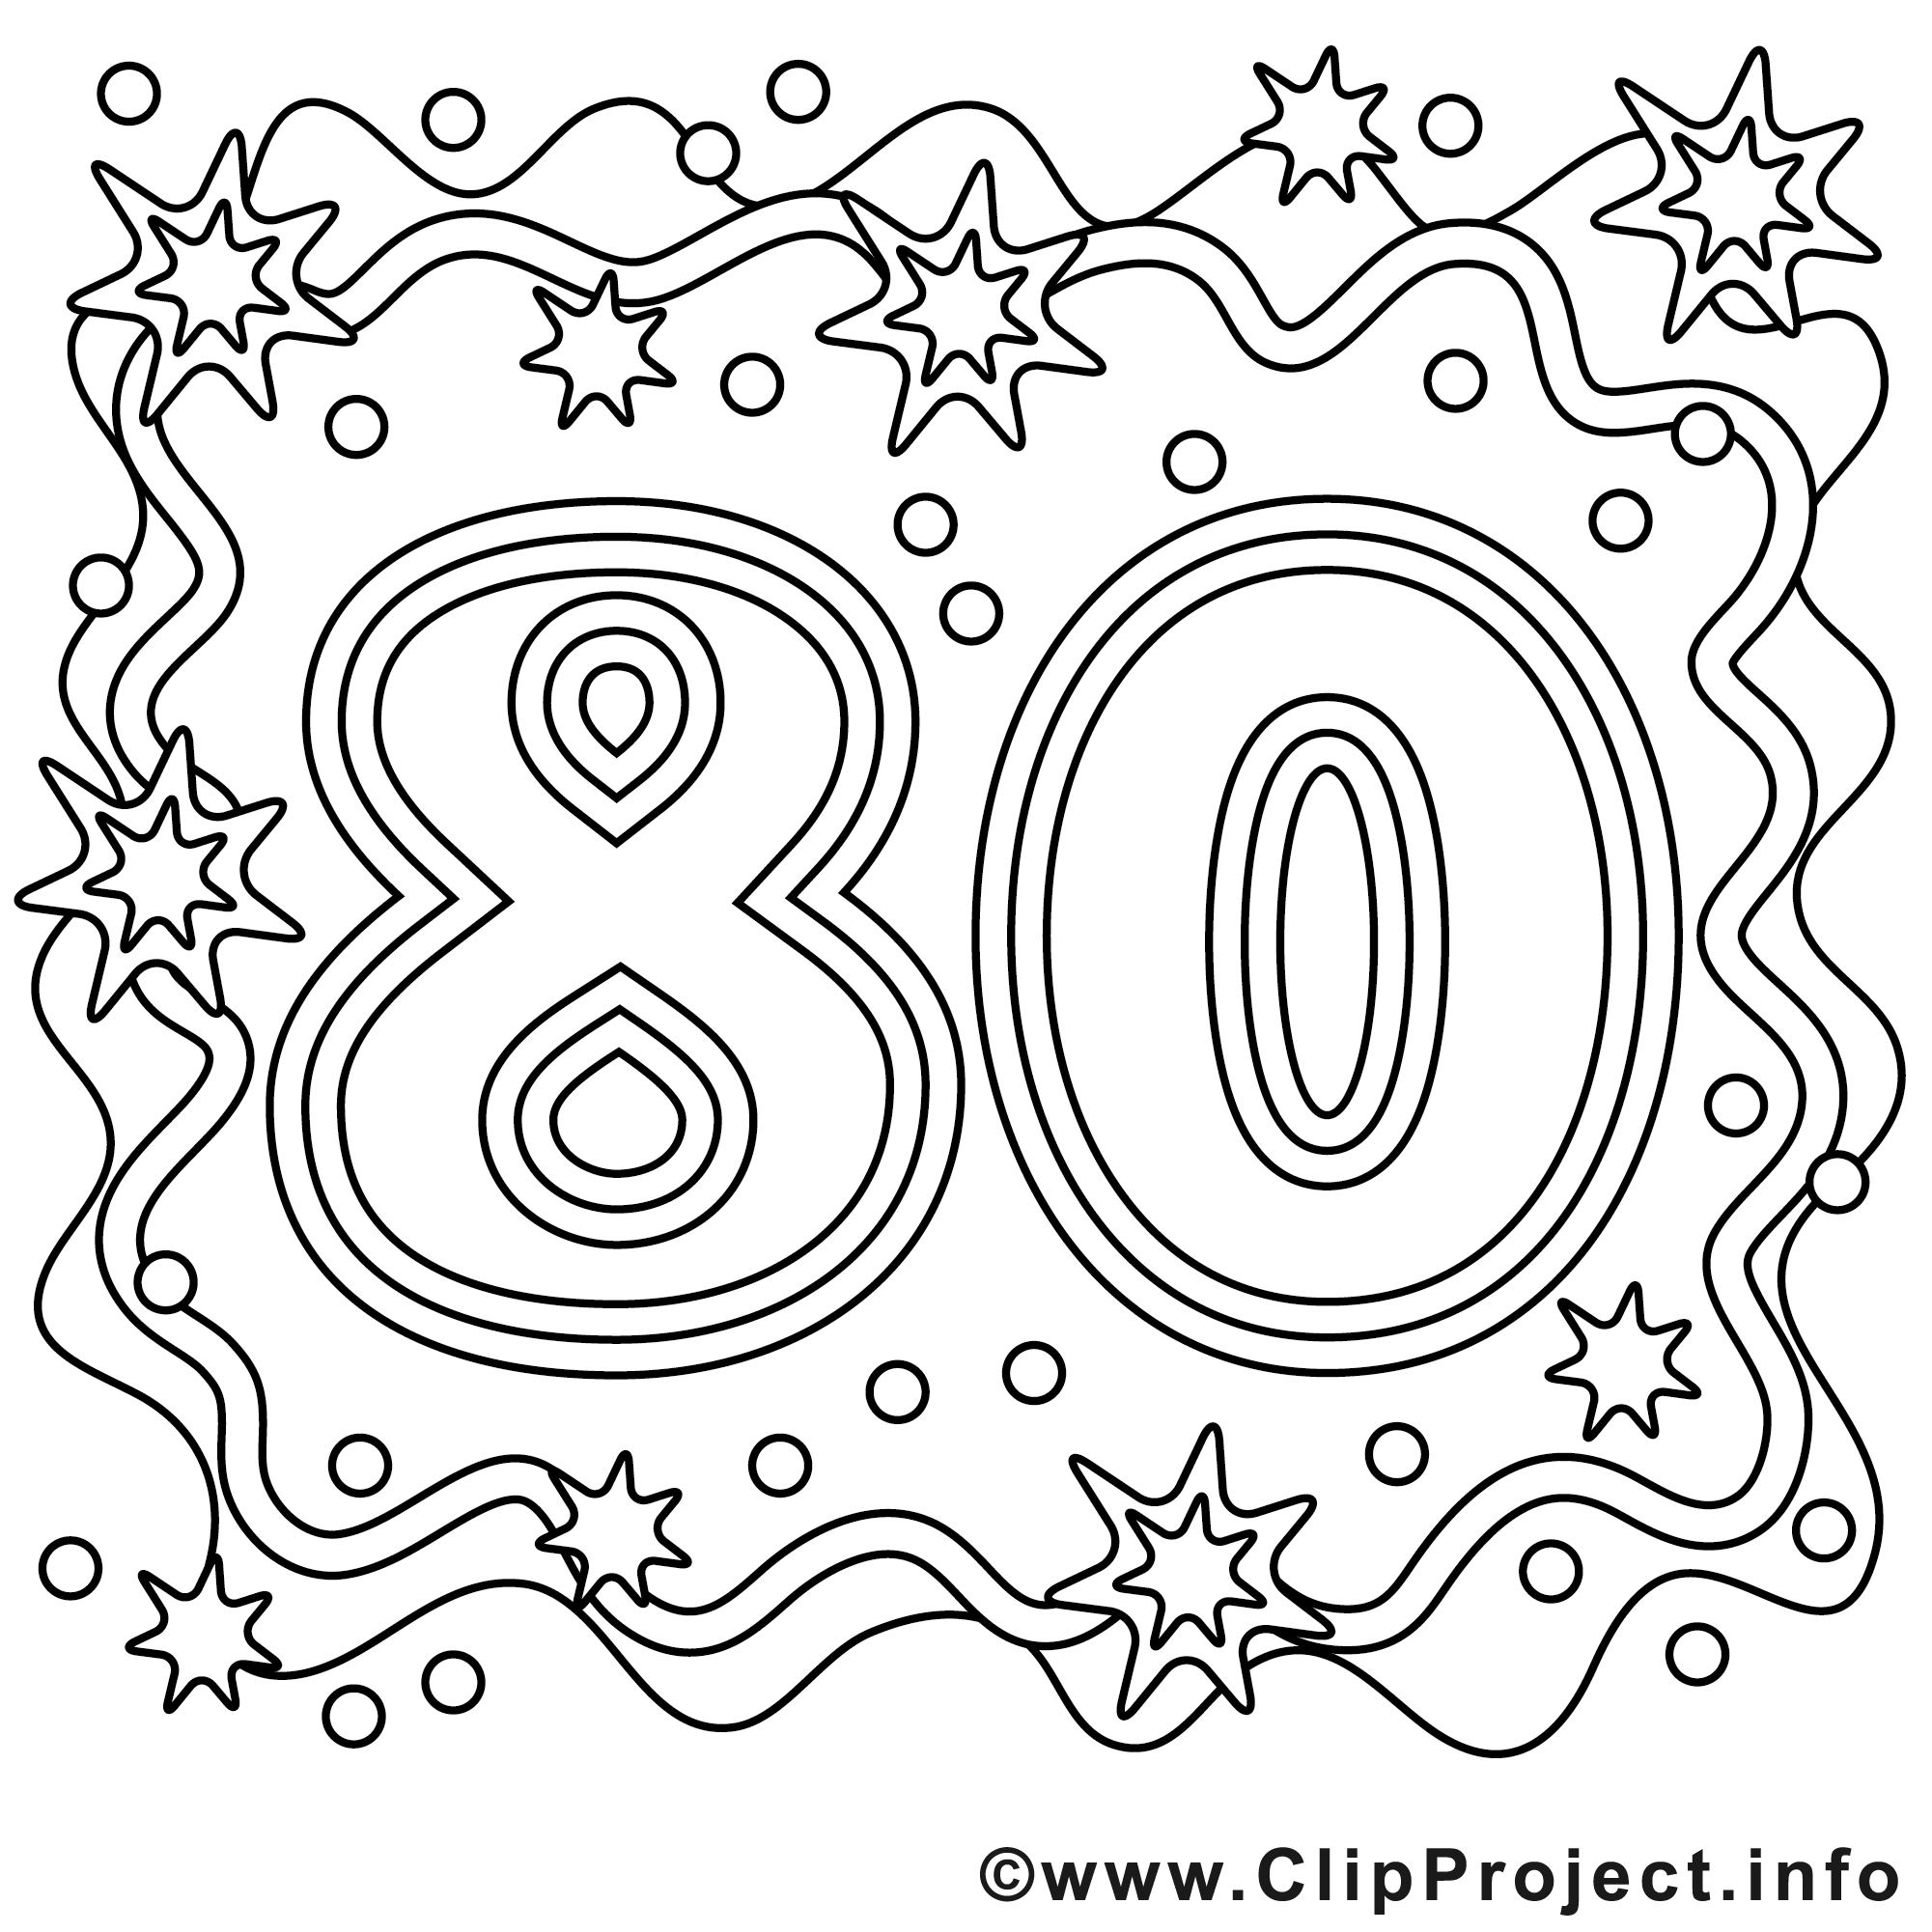 Cliparts zum 80 geburtstag svg royalty free library Cliparts zum 80 geburtstag - ClipartFox svg royalty free library